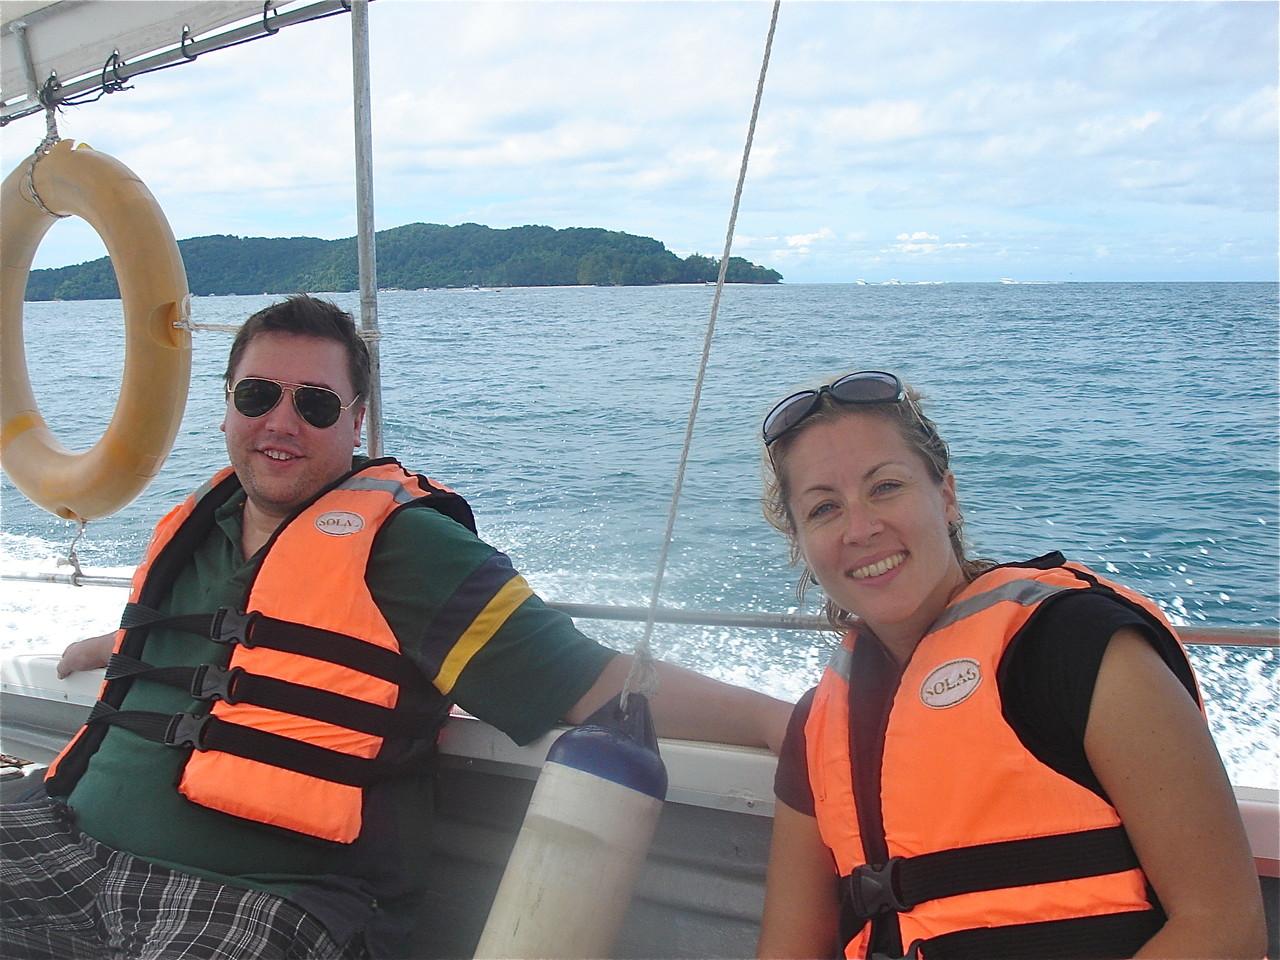 Greg Wagner & Emily Barner, near Kota Kinabalu, Sabah, Borneo